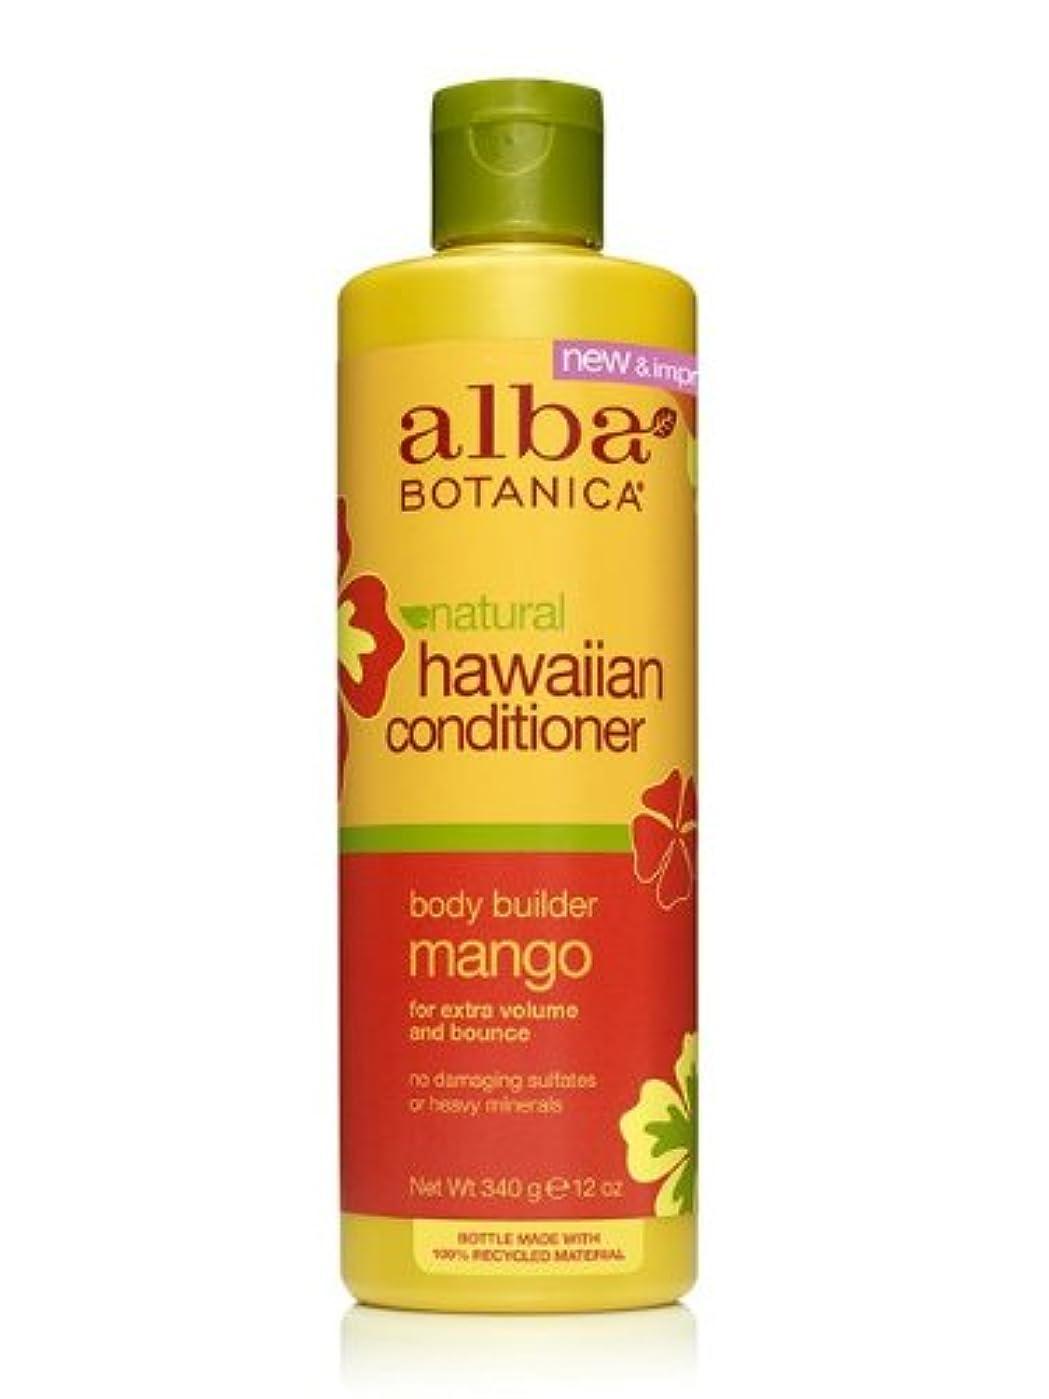 alba BOTANICA アルバボタニカ ハワイアン ヘアコンディショナー MG マンゴー